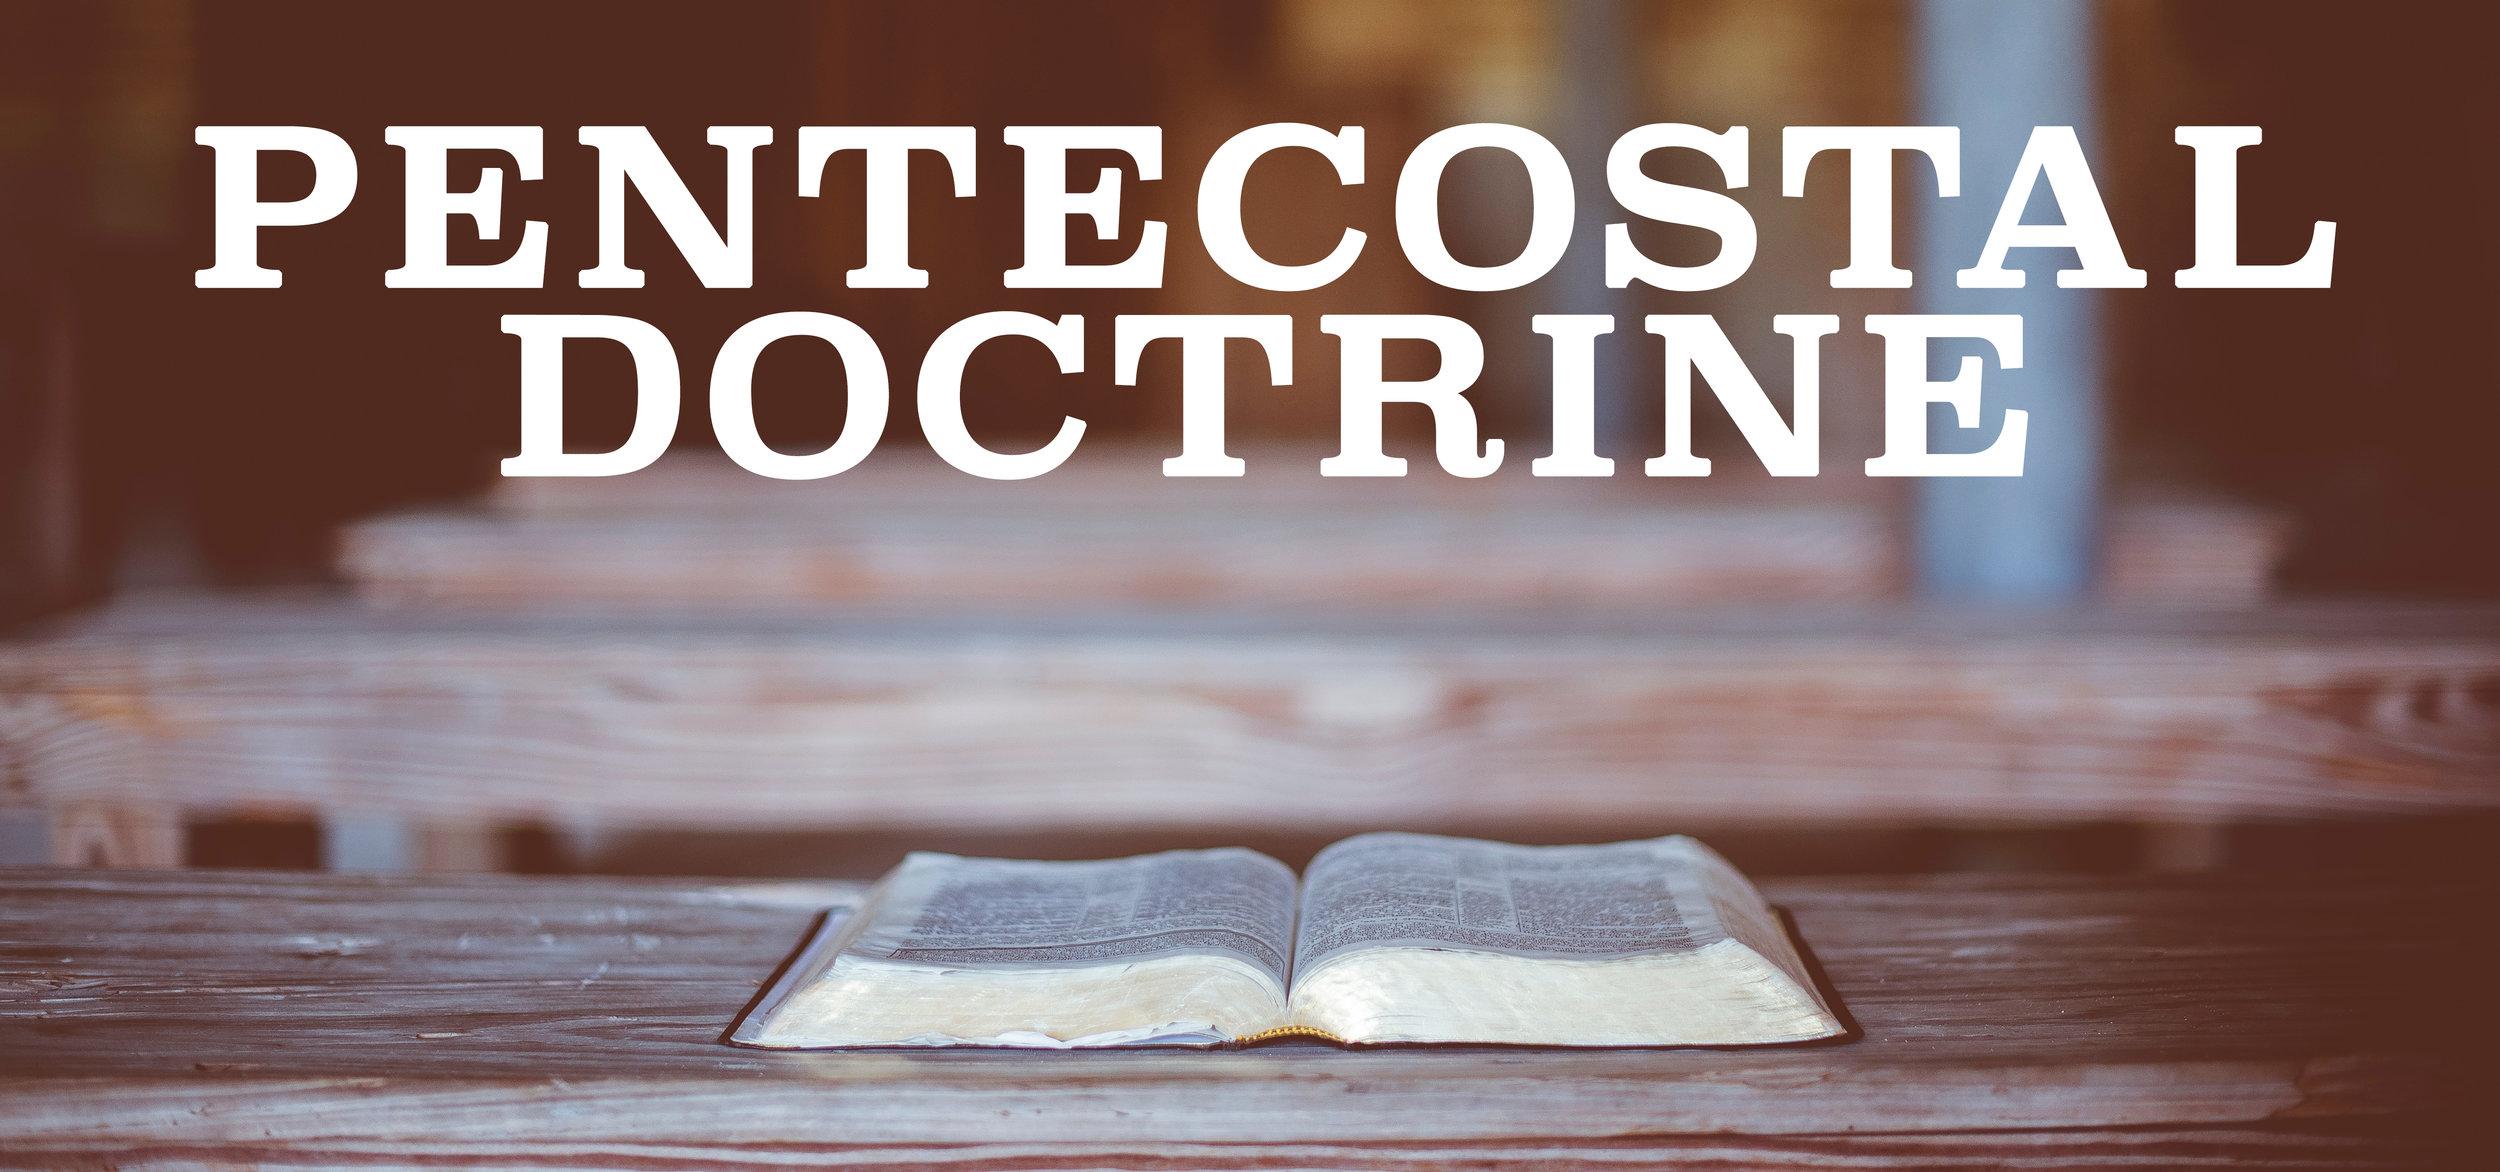 PentecostalDoctrineWebImage.jpg